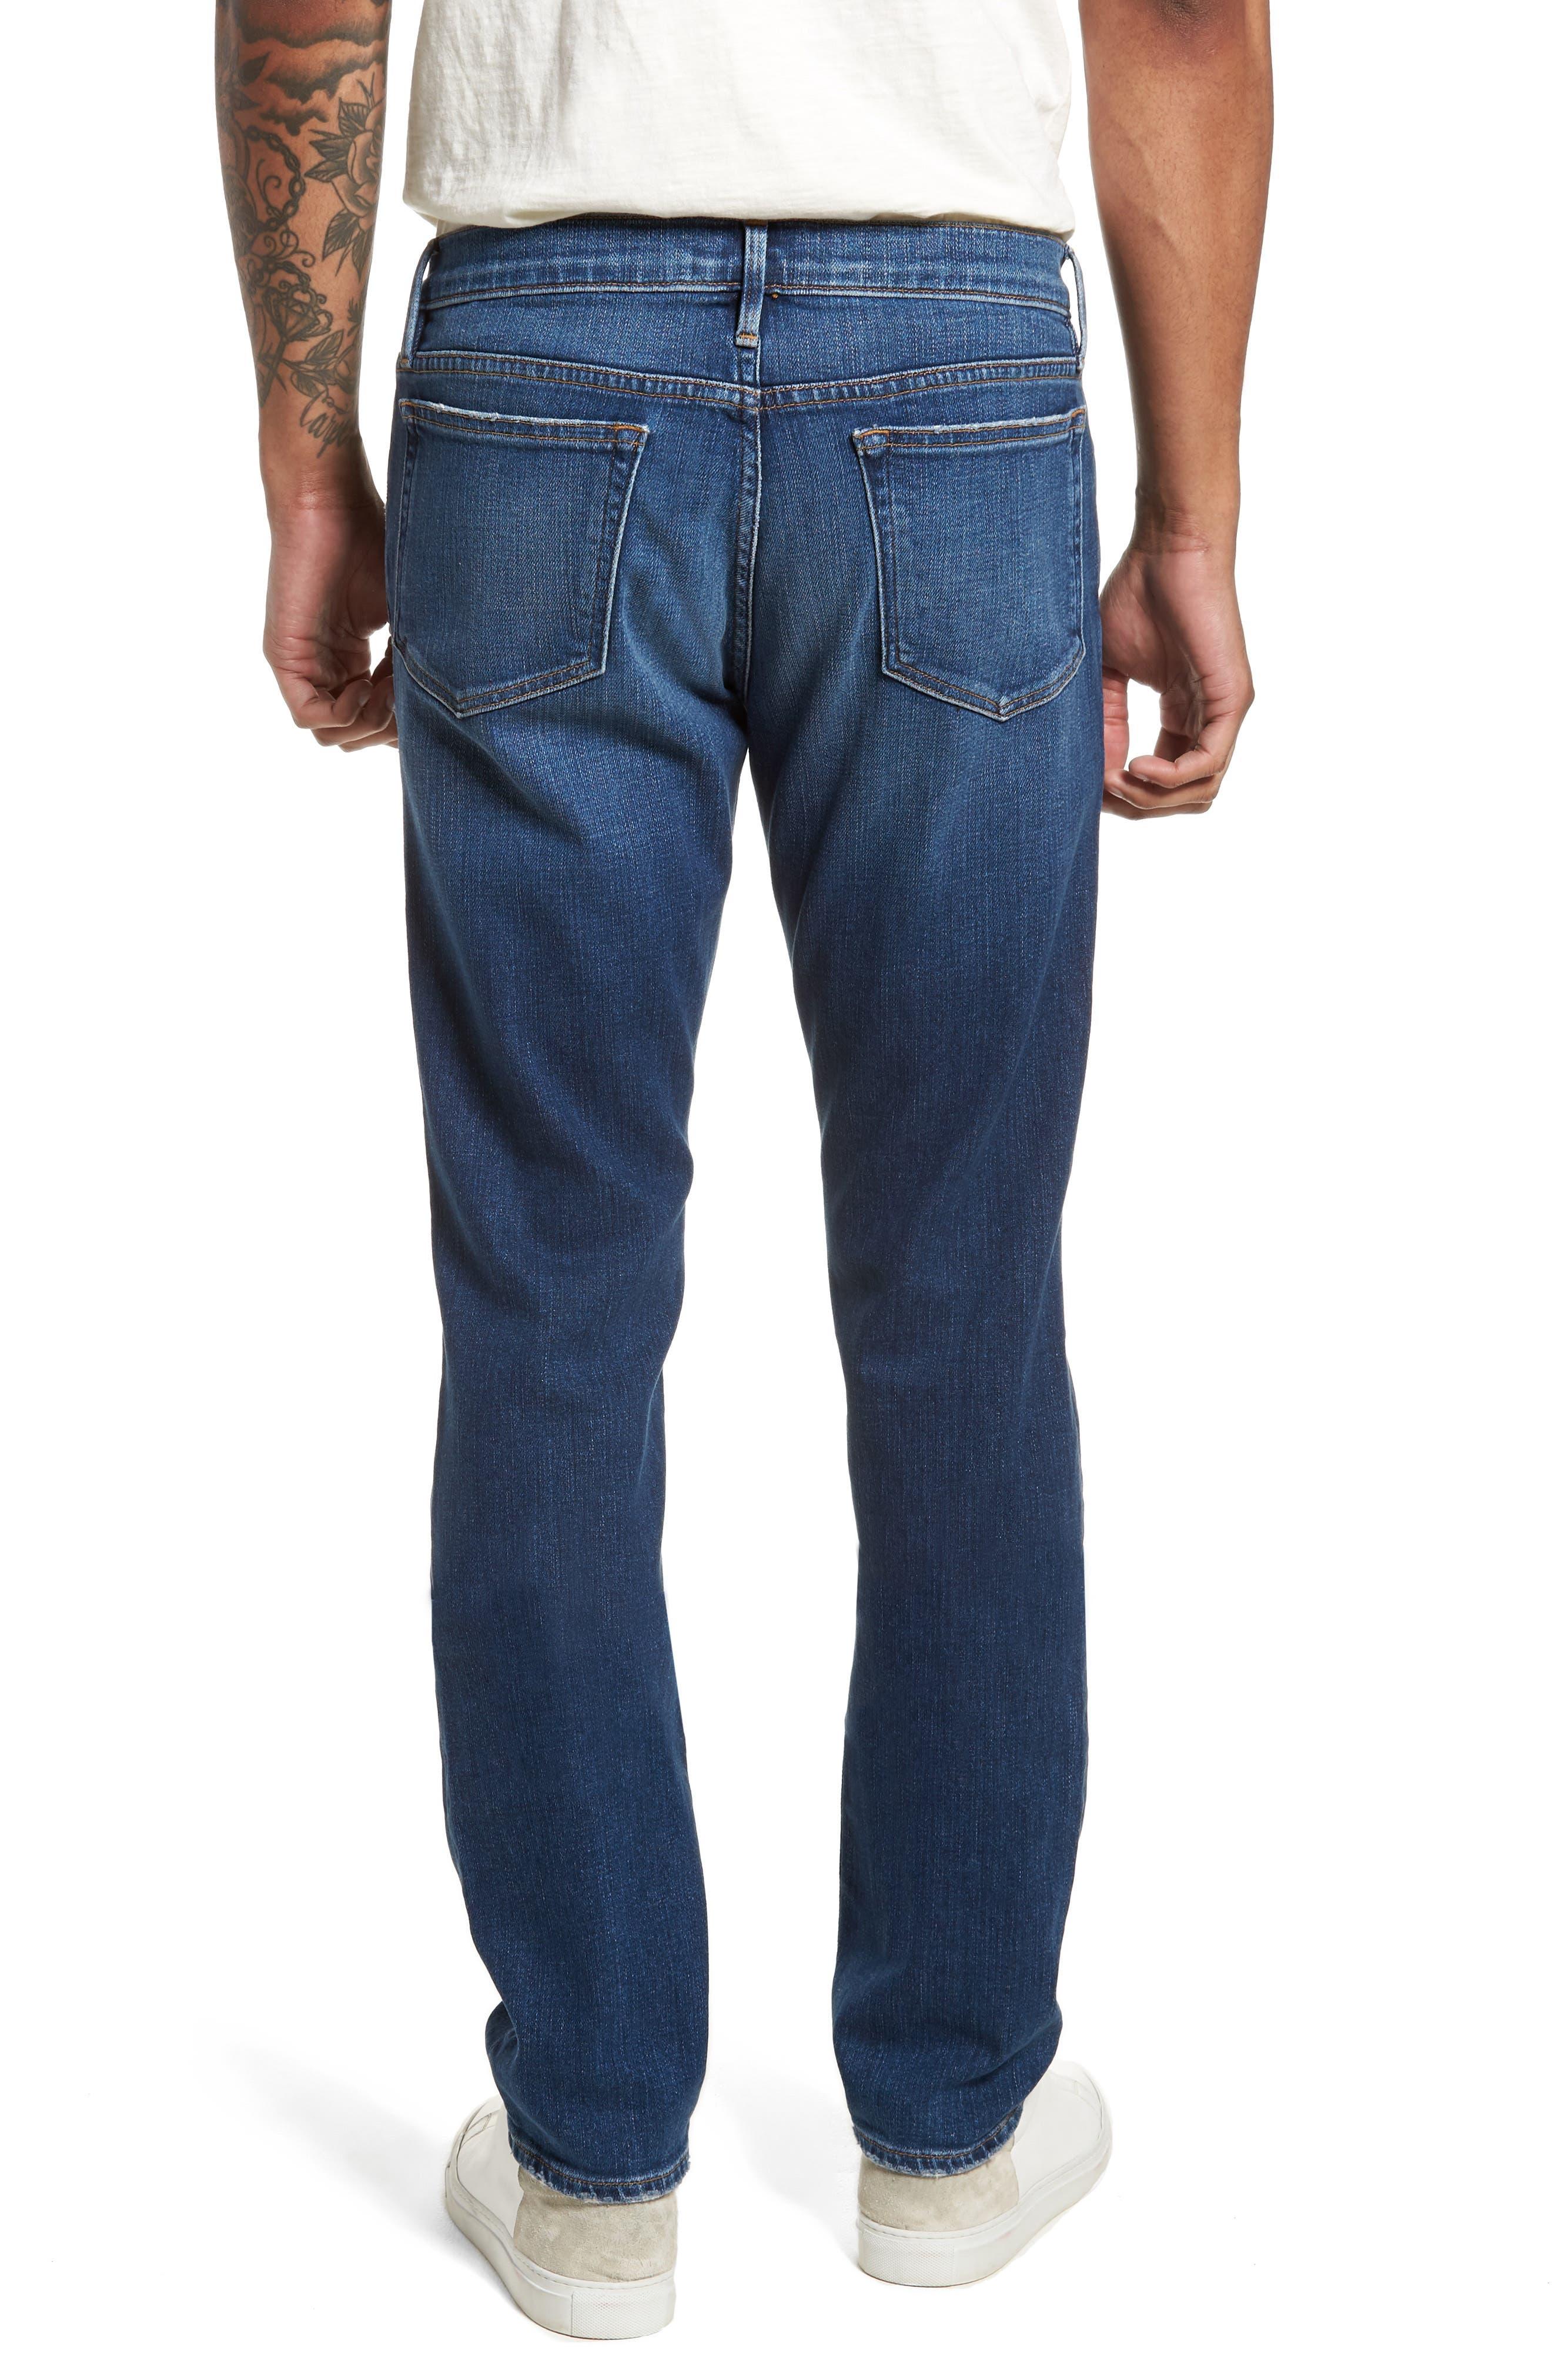 L'Homme Skinny Fit Jeans,                             Alternate thumbnail 2, color,                             420